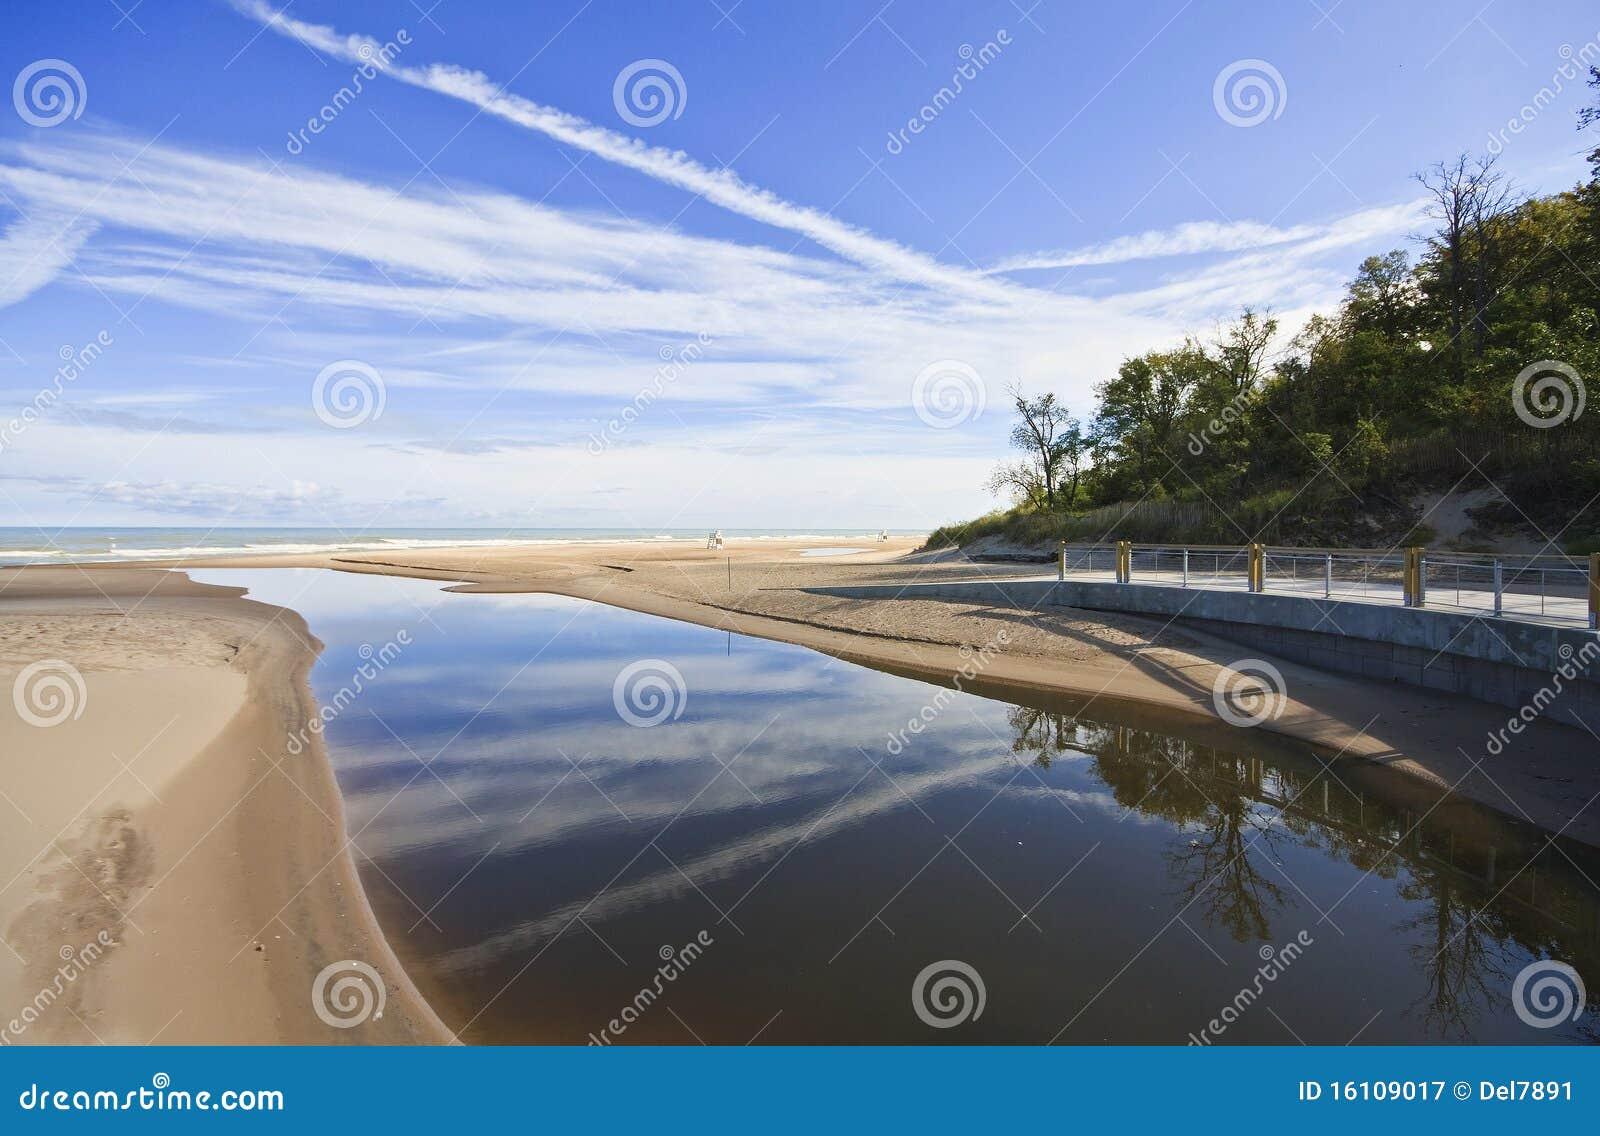 Indiana Dunes State Park Main Beach